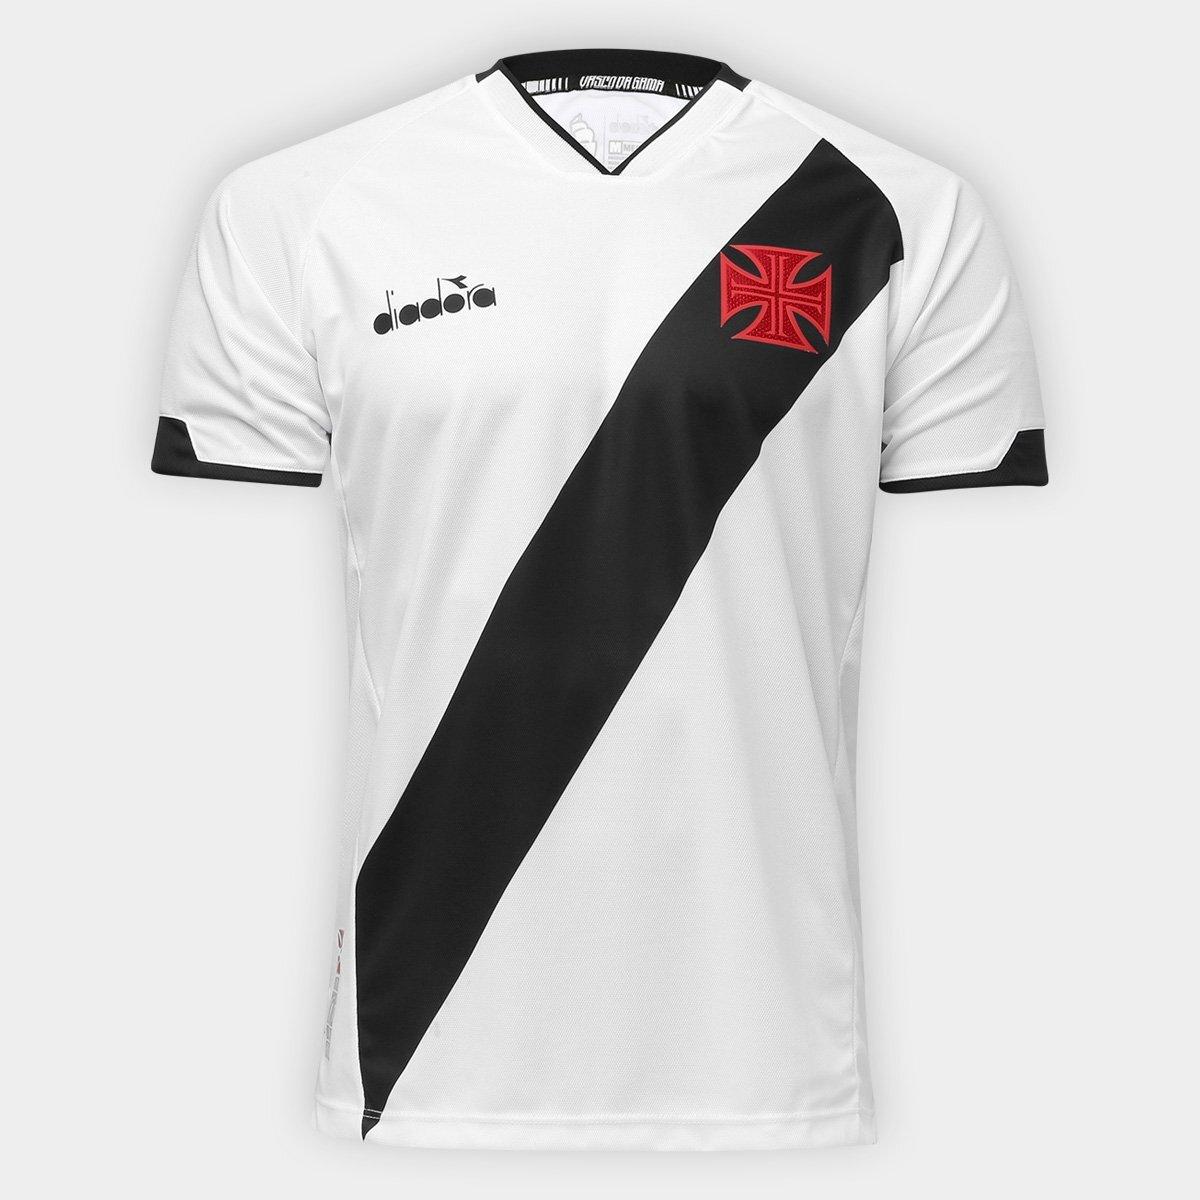 2018 2019 Diadora Brazil Vasco da Gama Third Soccer Football Jersey Shirt